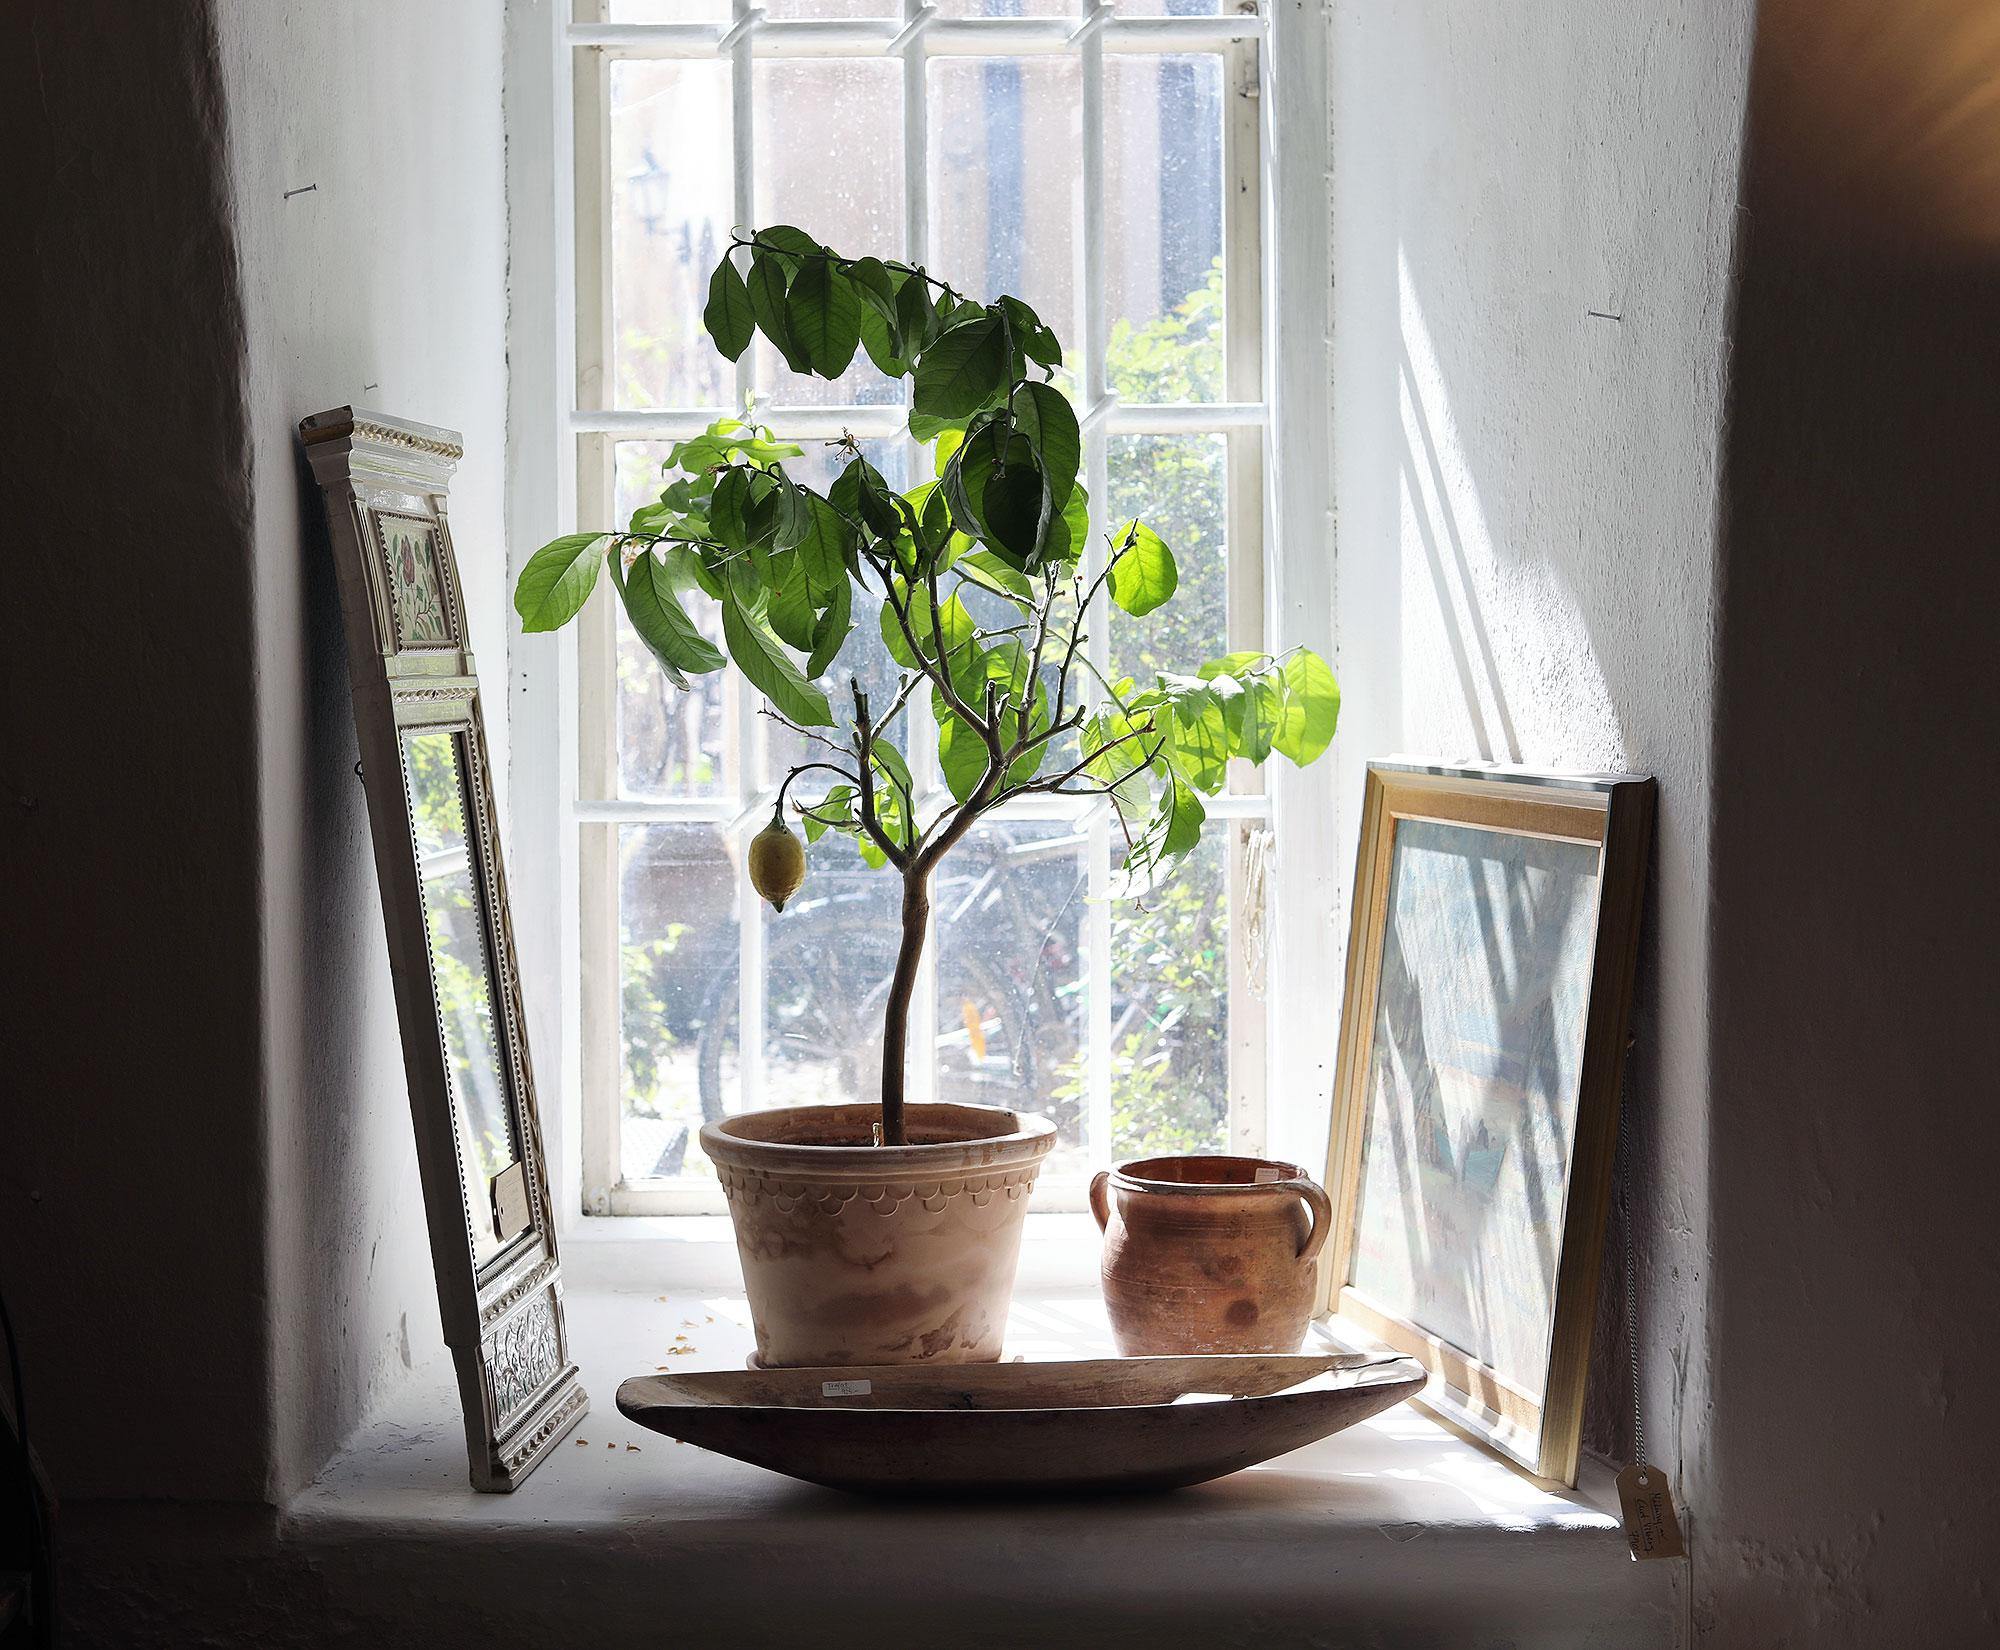 visby gotland akantus vintage inredning citronträd kruka